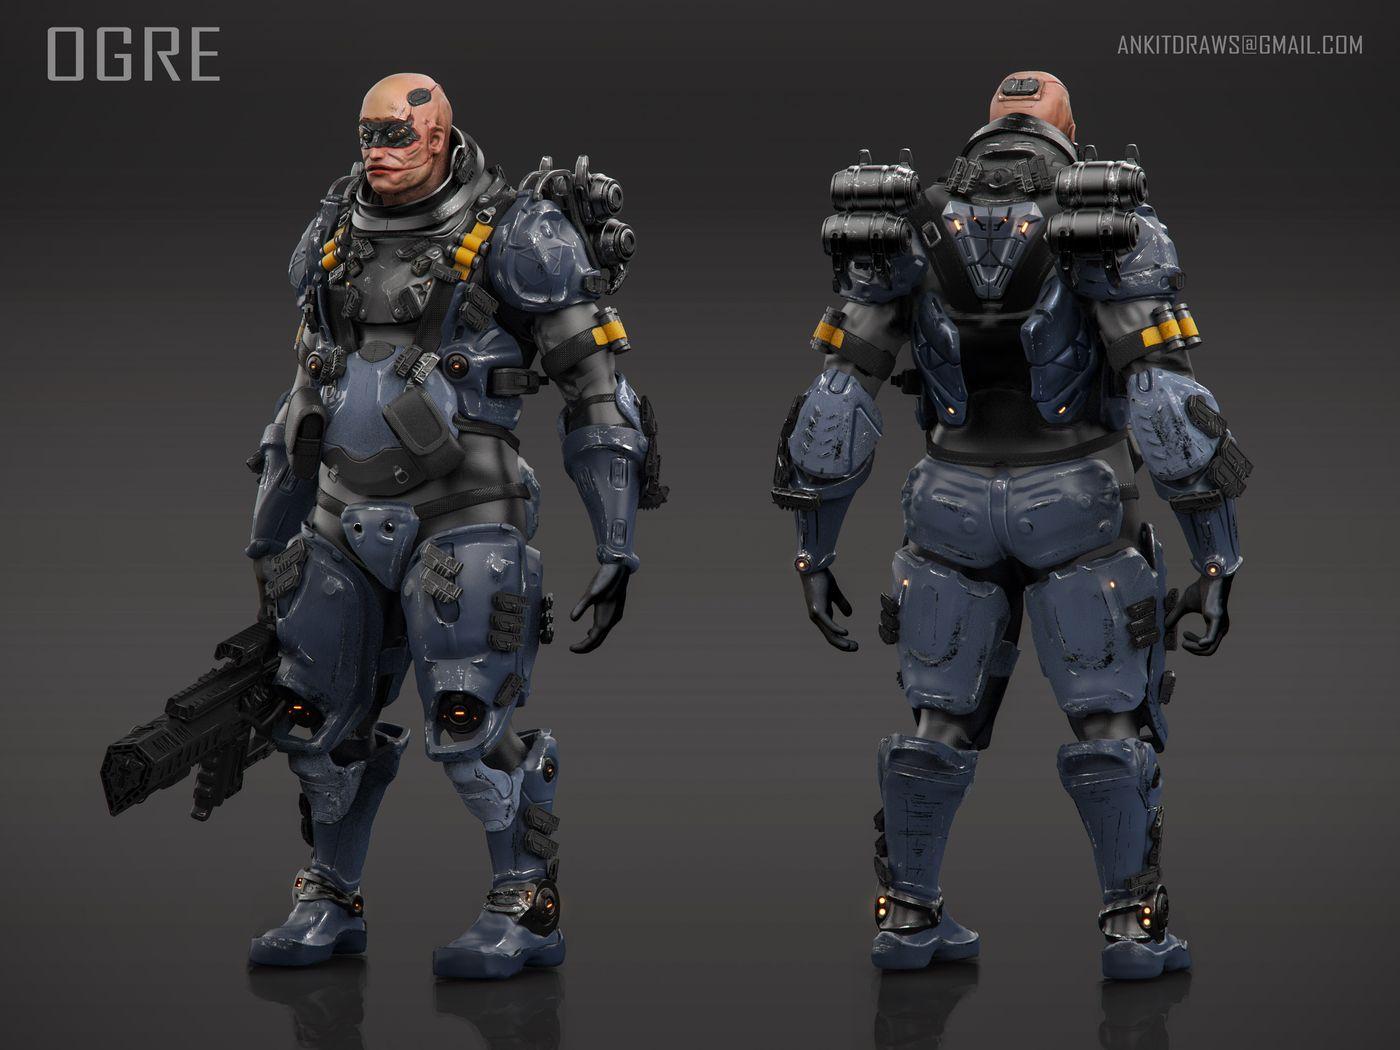 ogre unit character design